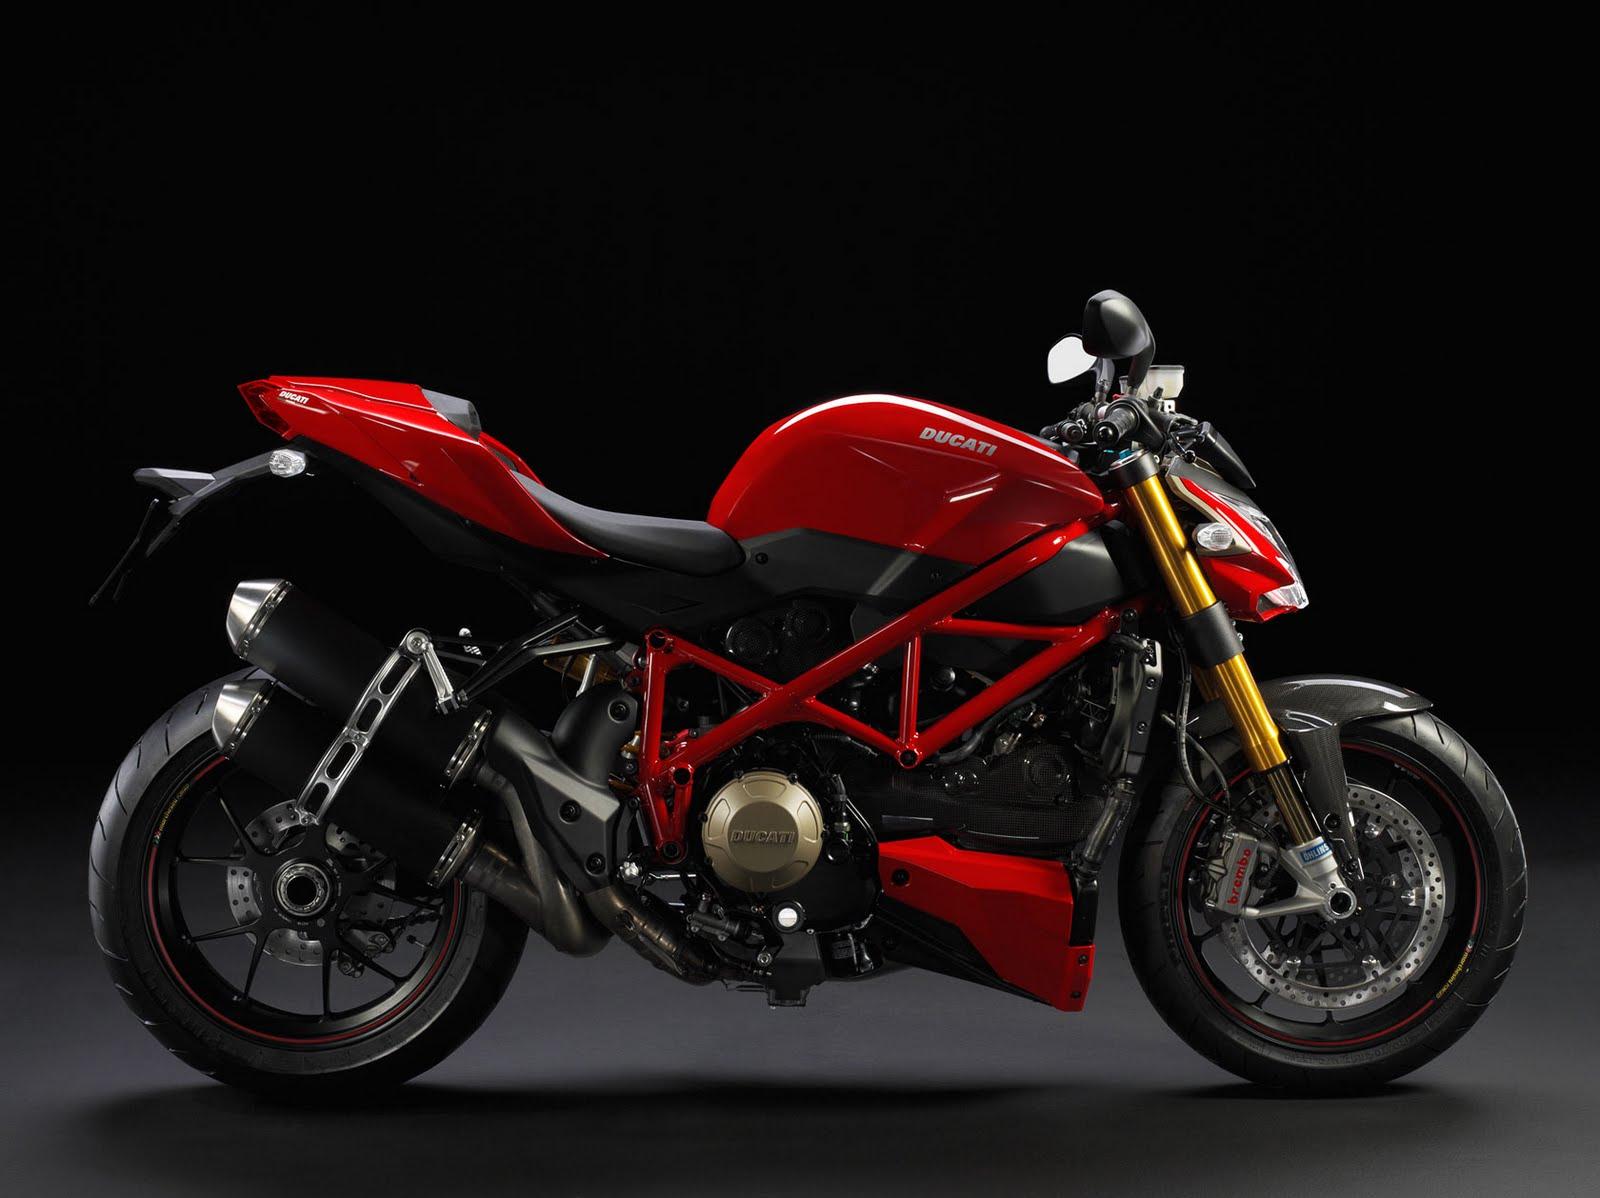 Ducati Wallpapers  Full HD wallpaper search